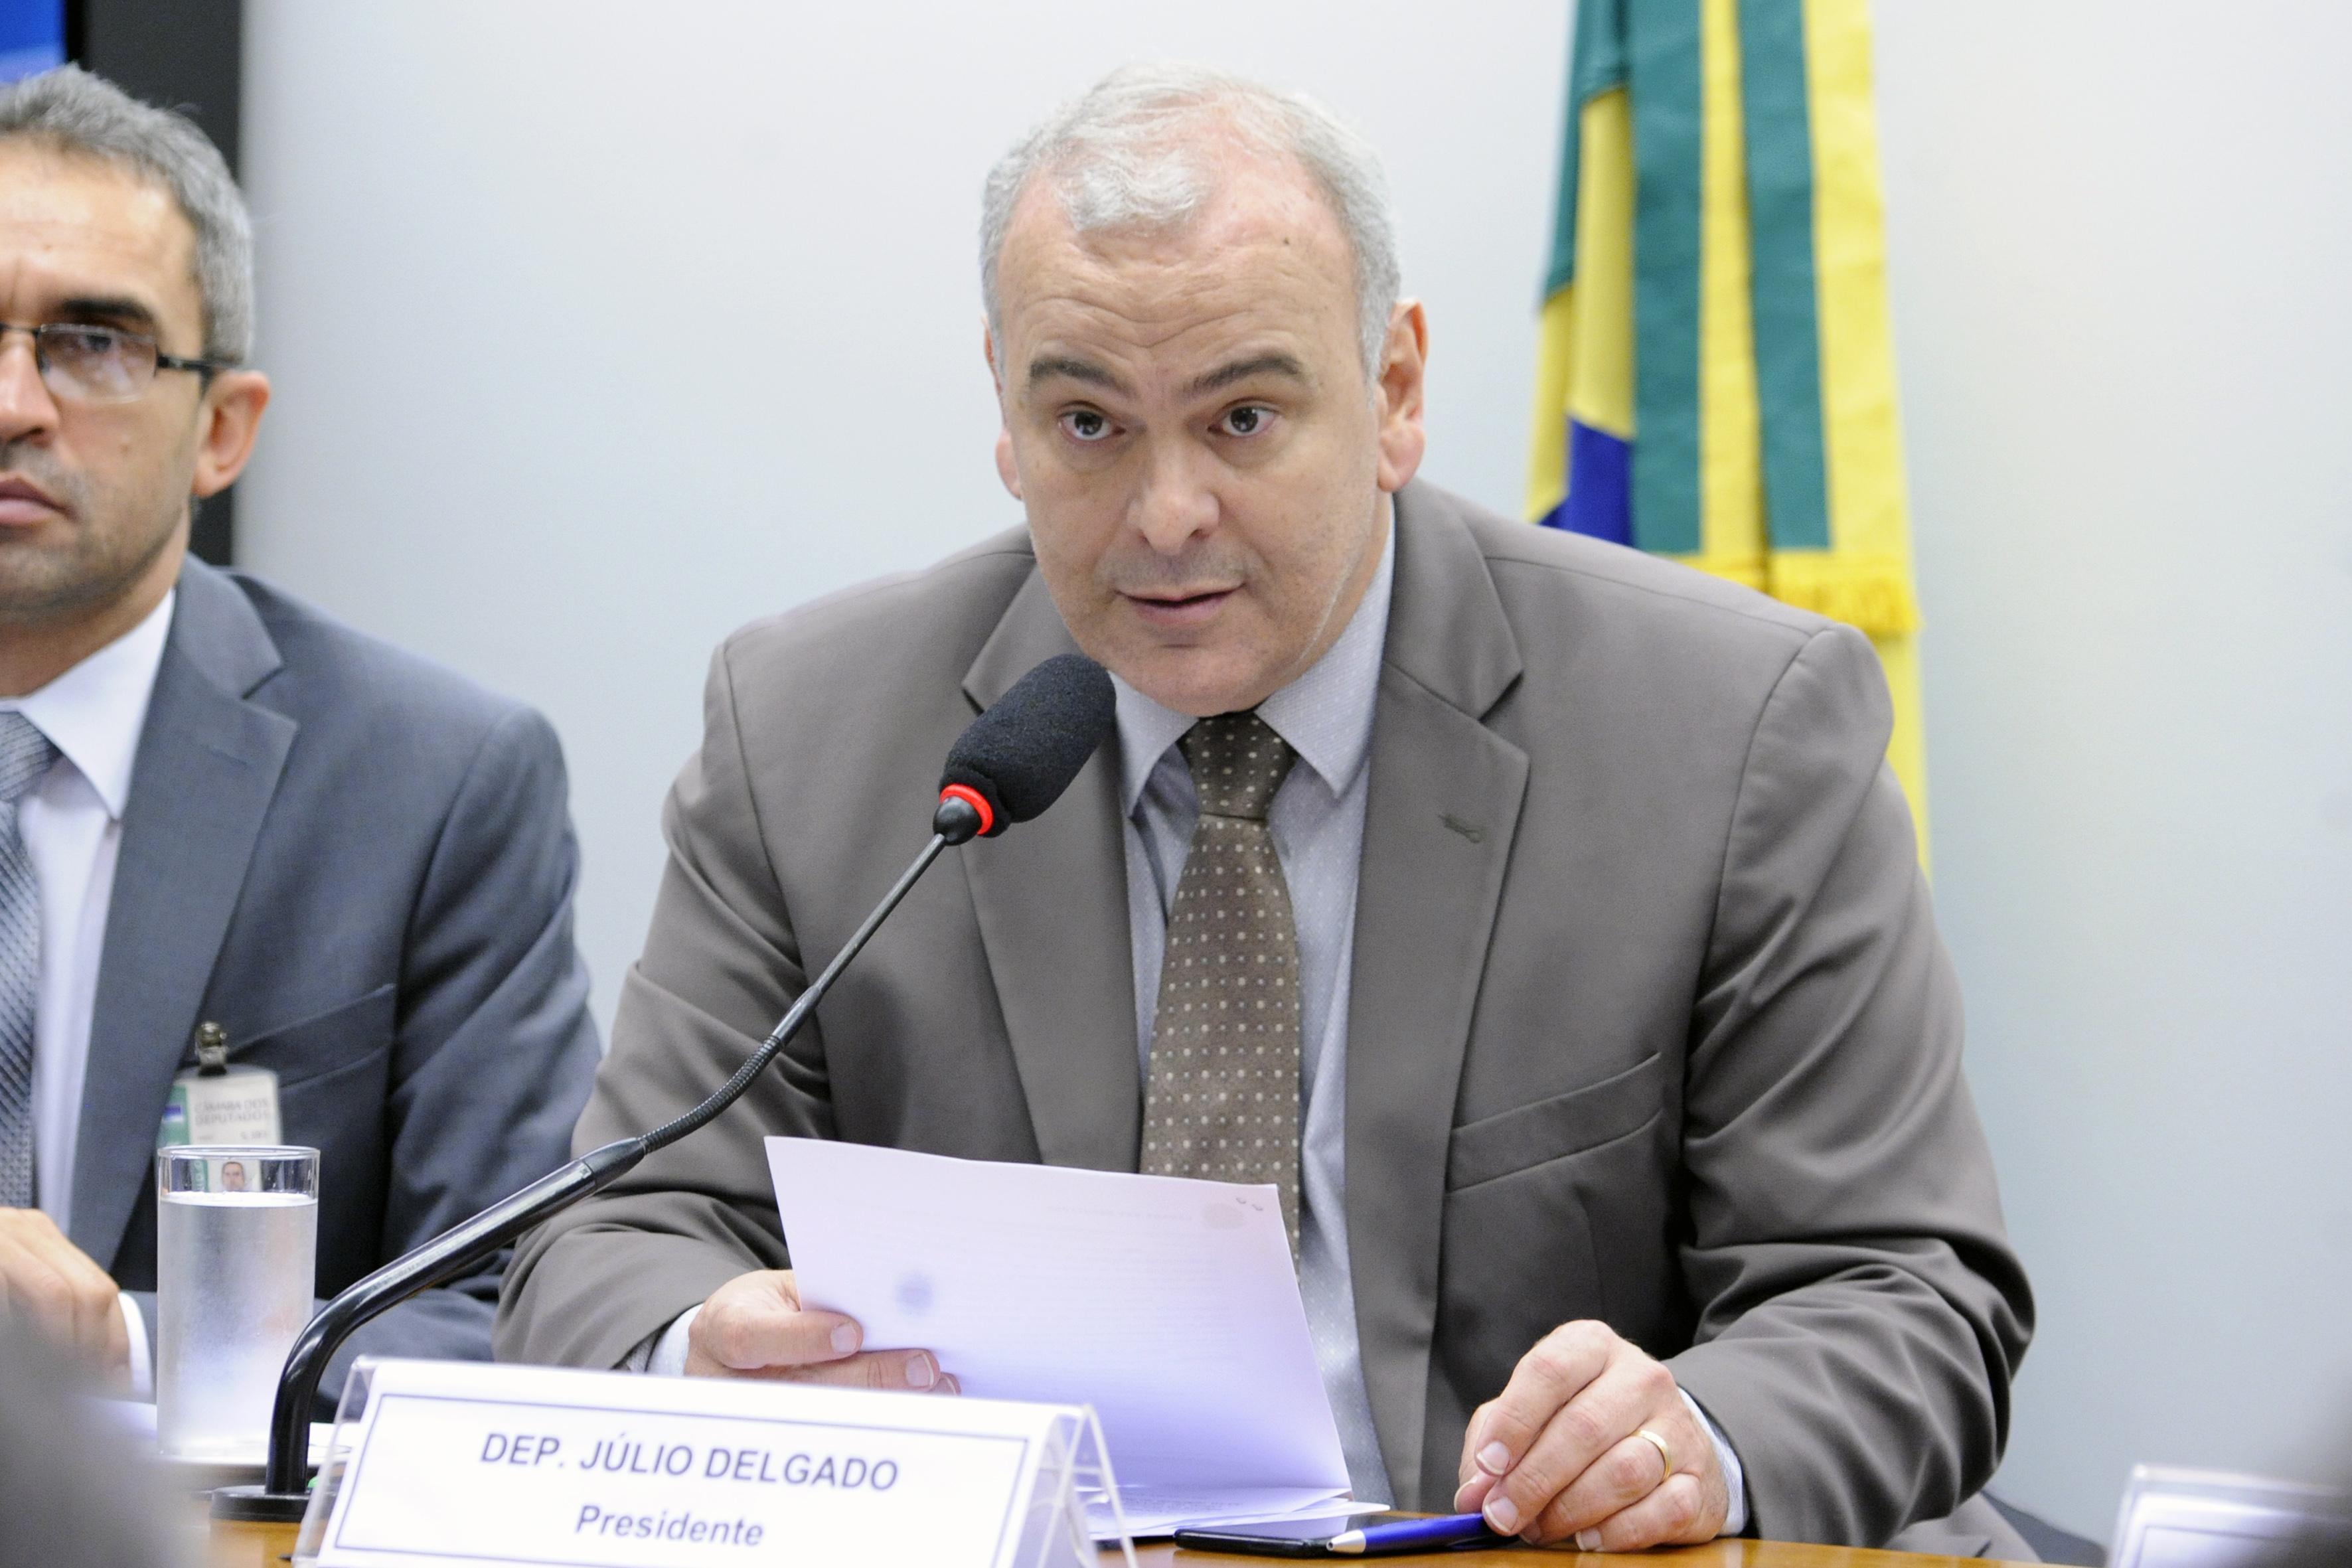 Audiência pública. Dep. Júlio Delgado (PSB-MG)